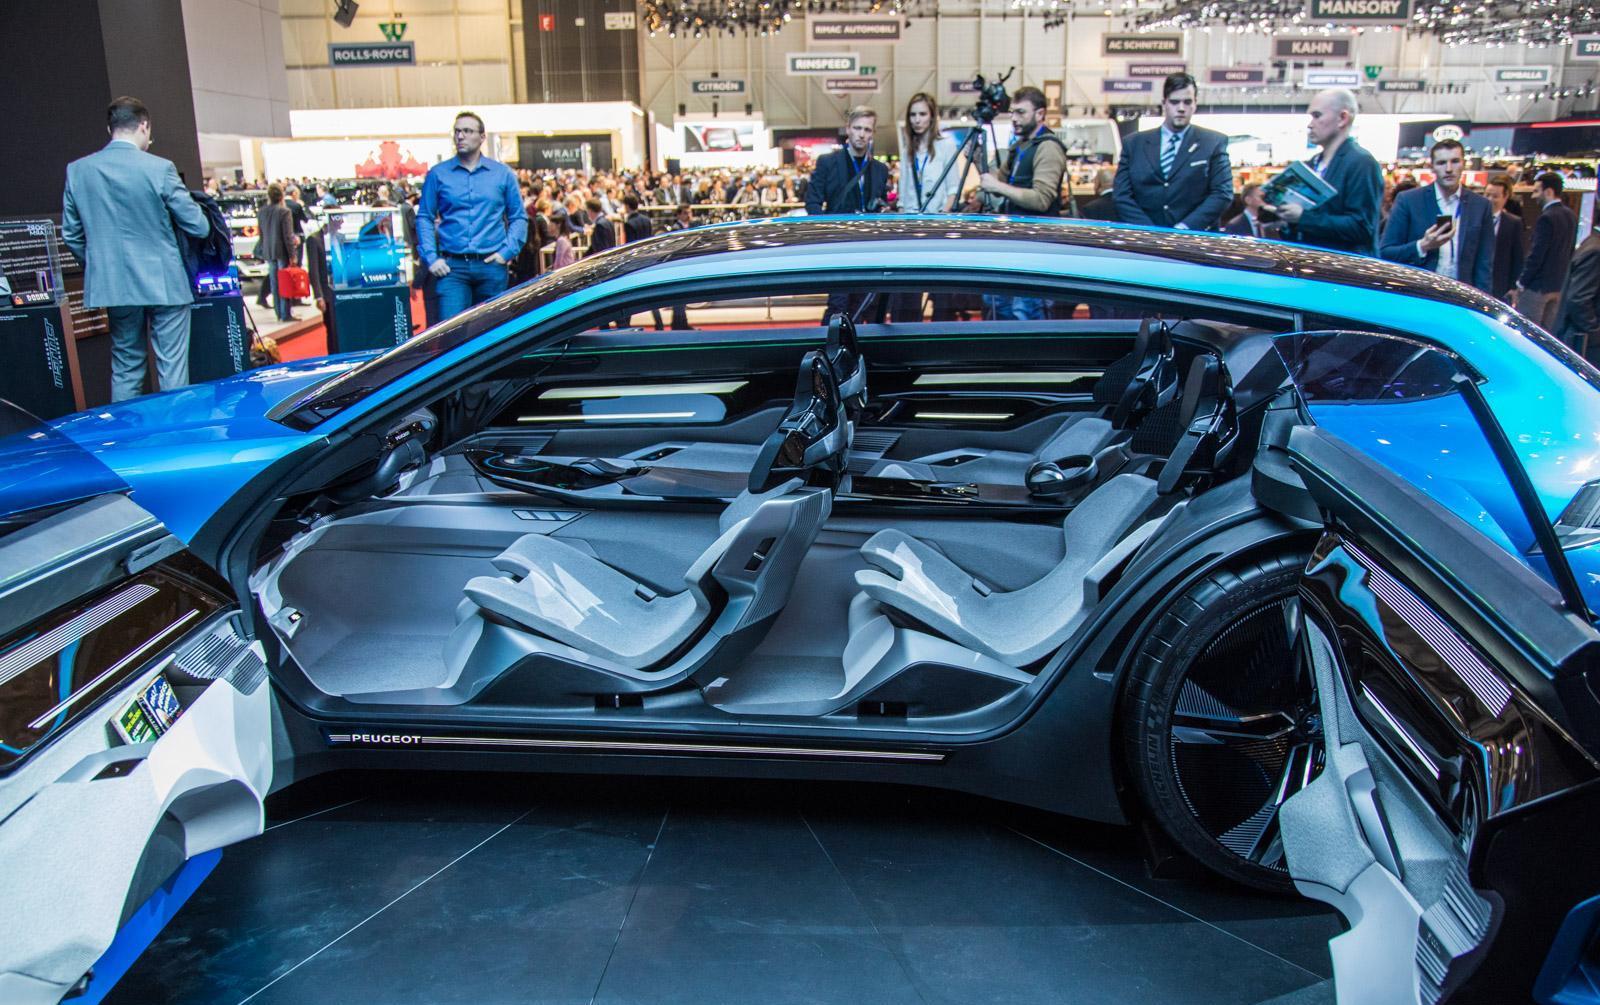 Peugeot-instinct-concept-007